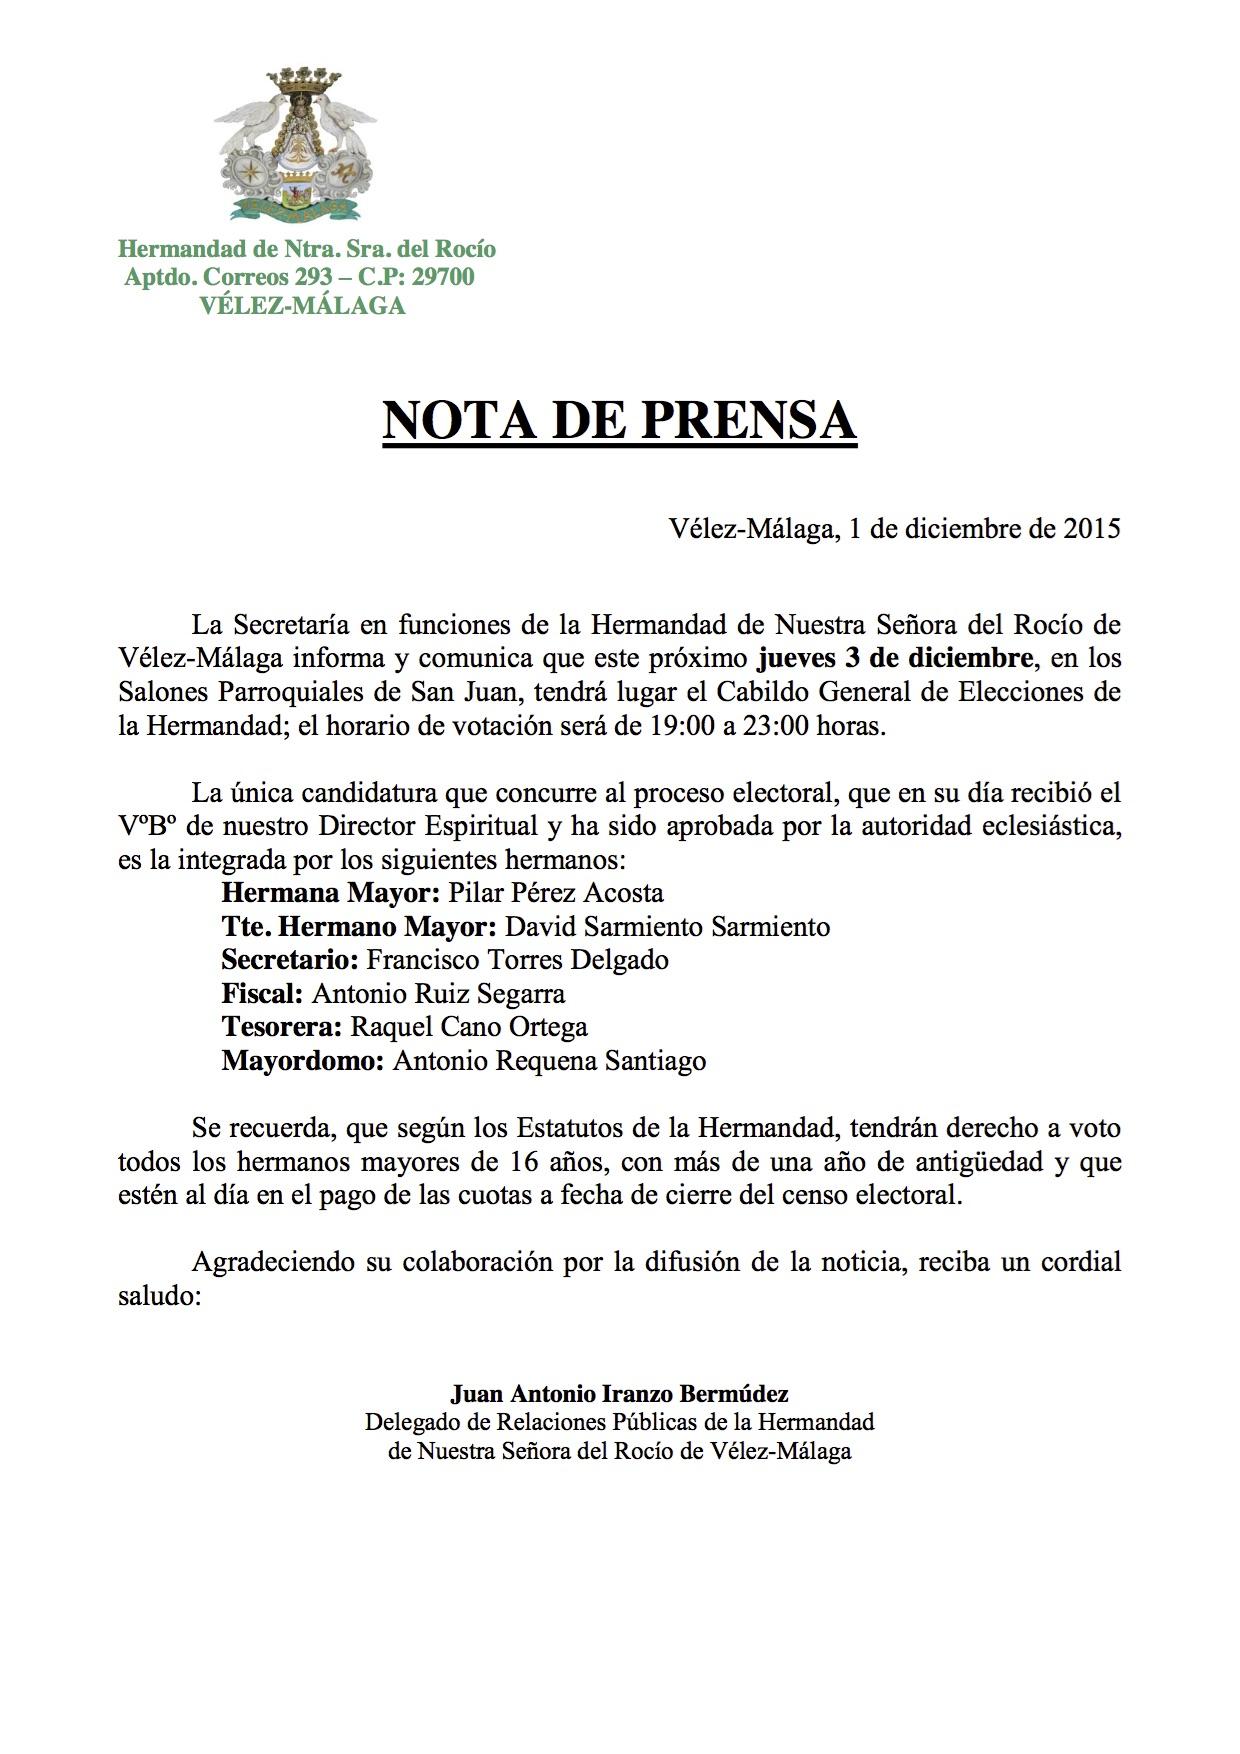 Velez Malaga Cabildo de Elecciones 2015